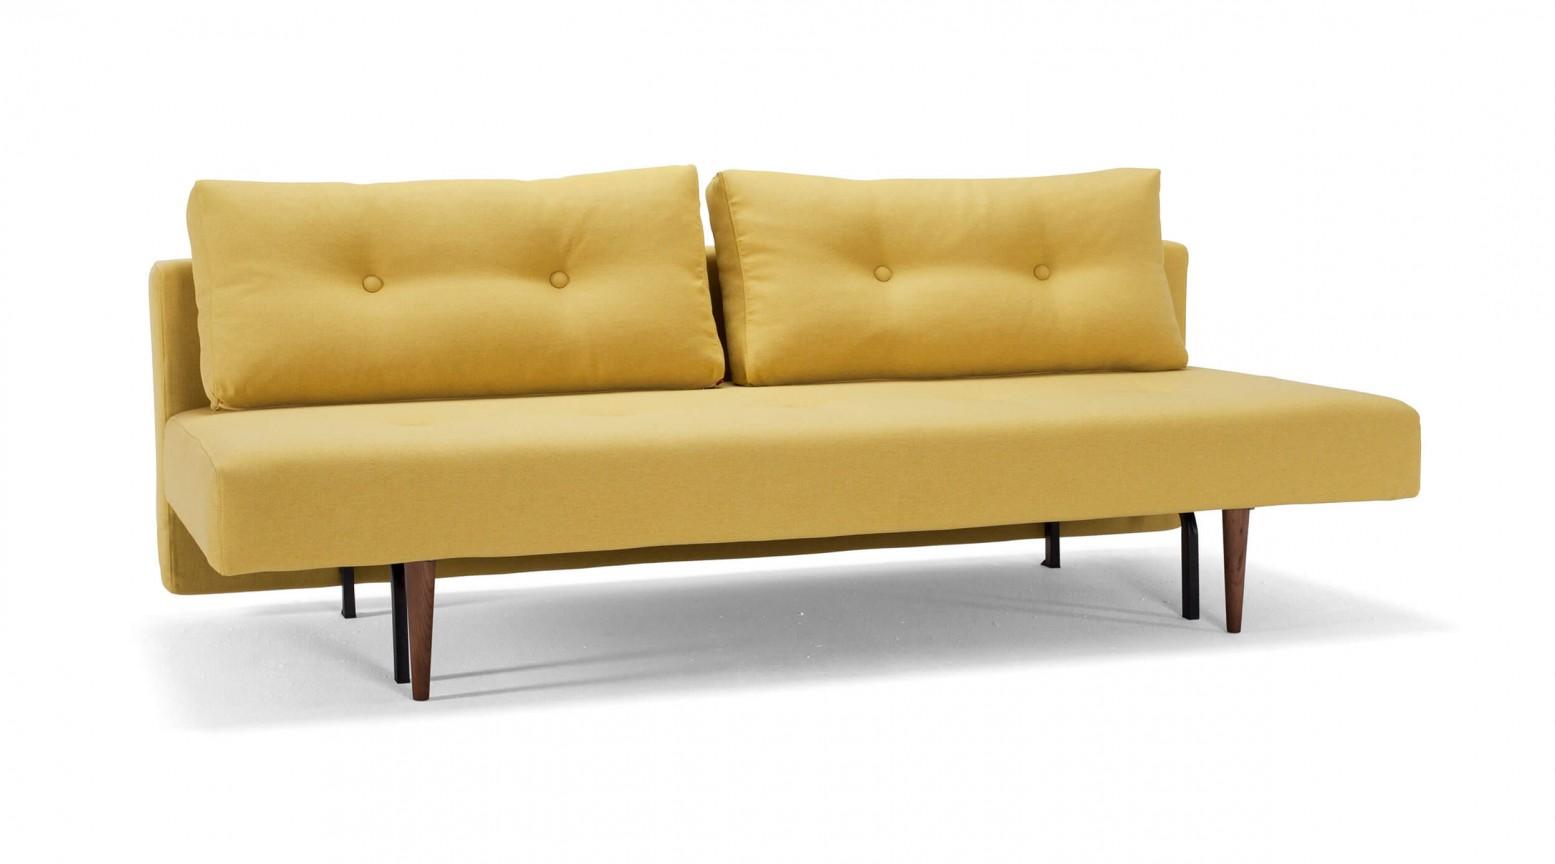 Astonishing Recast Plus Sofa Bed 554 Soft Mustard Flower Fabric By Innovation Living Creativecarmelina Interior Chair Design Creativecarmelinacom